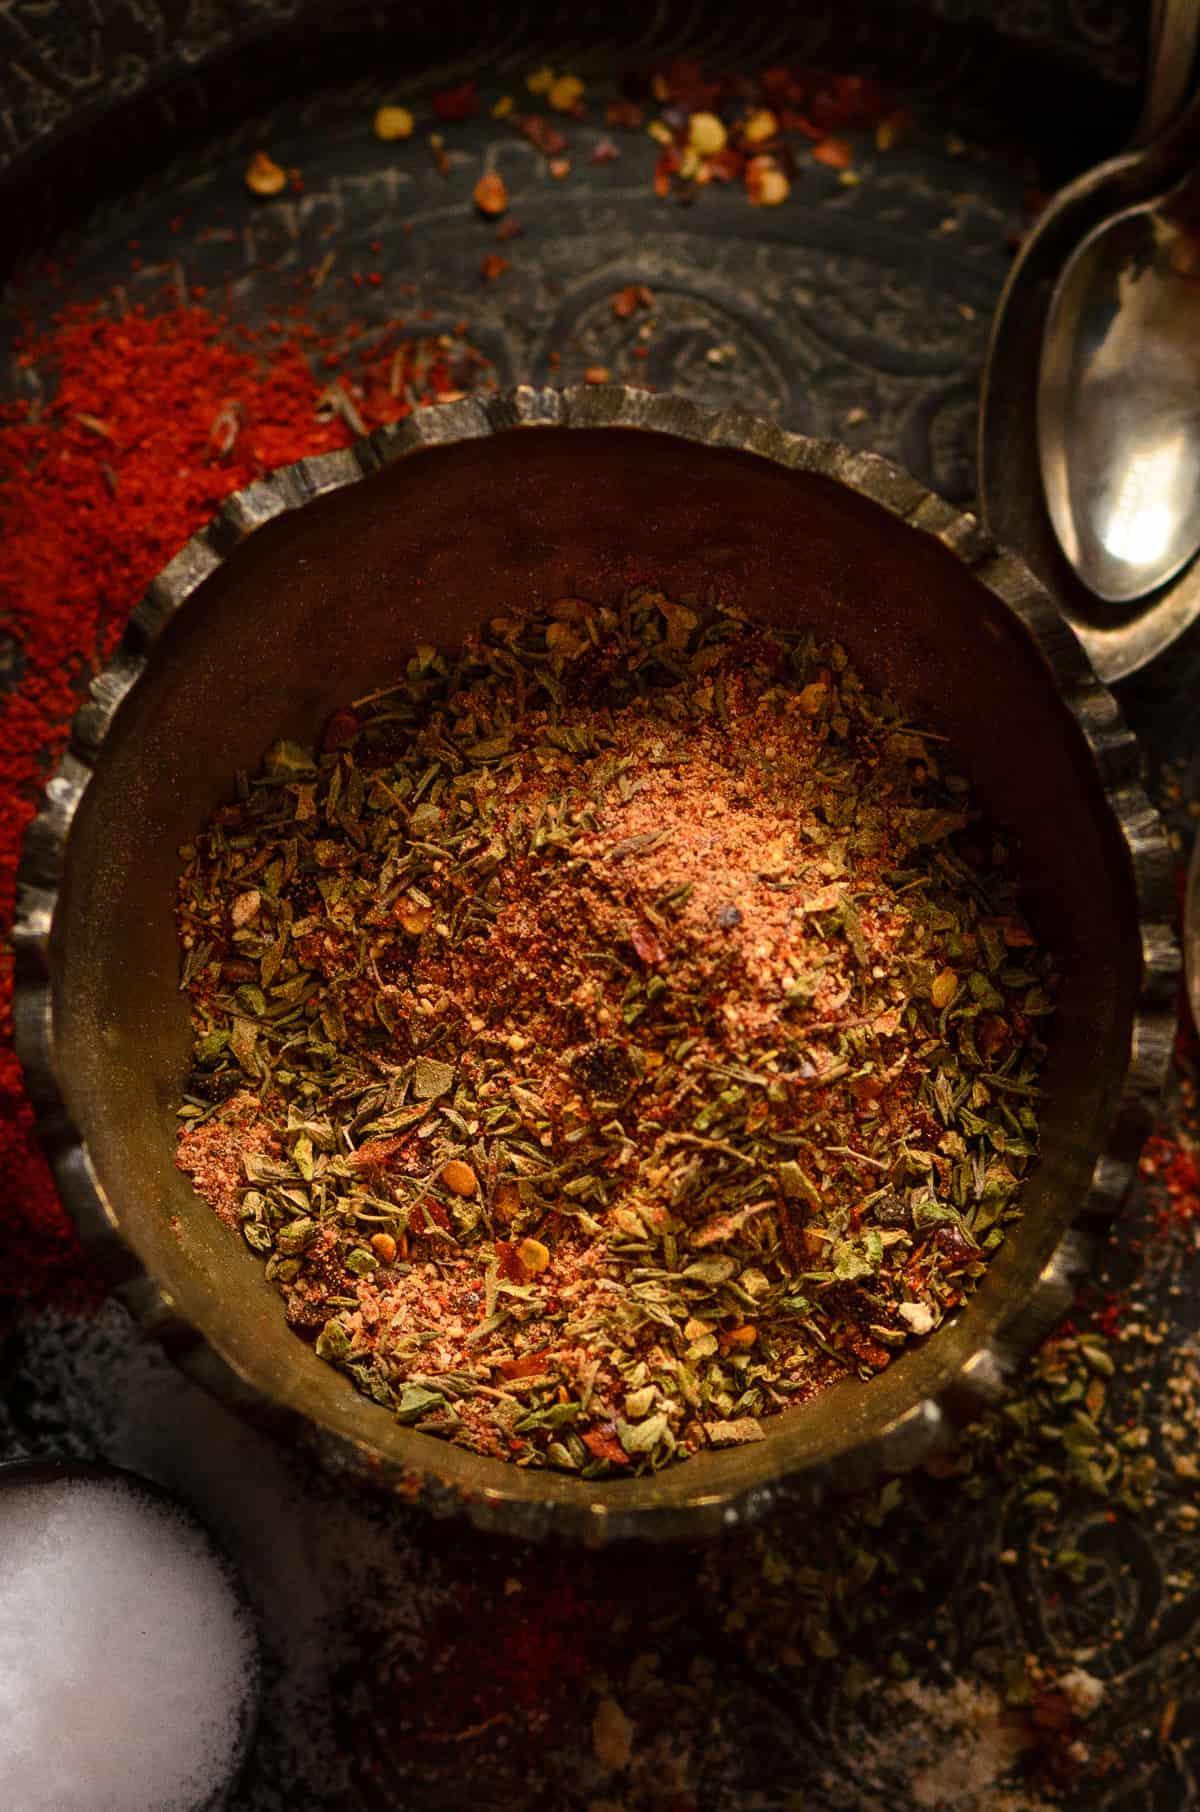 Overhead shot of Cajun seasoning spice mix in brass bowl.